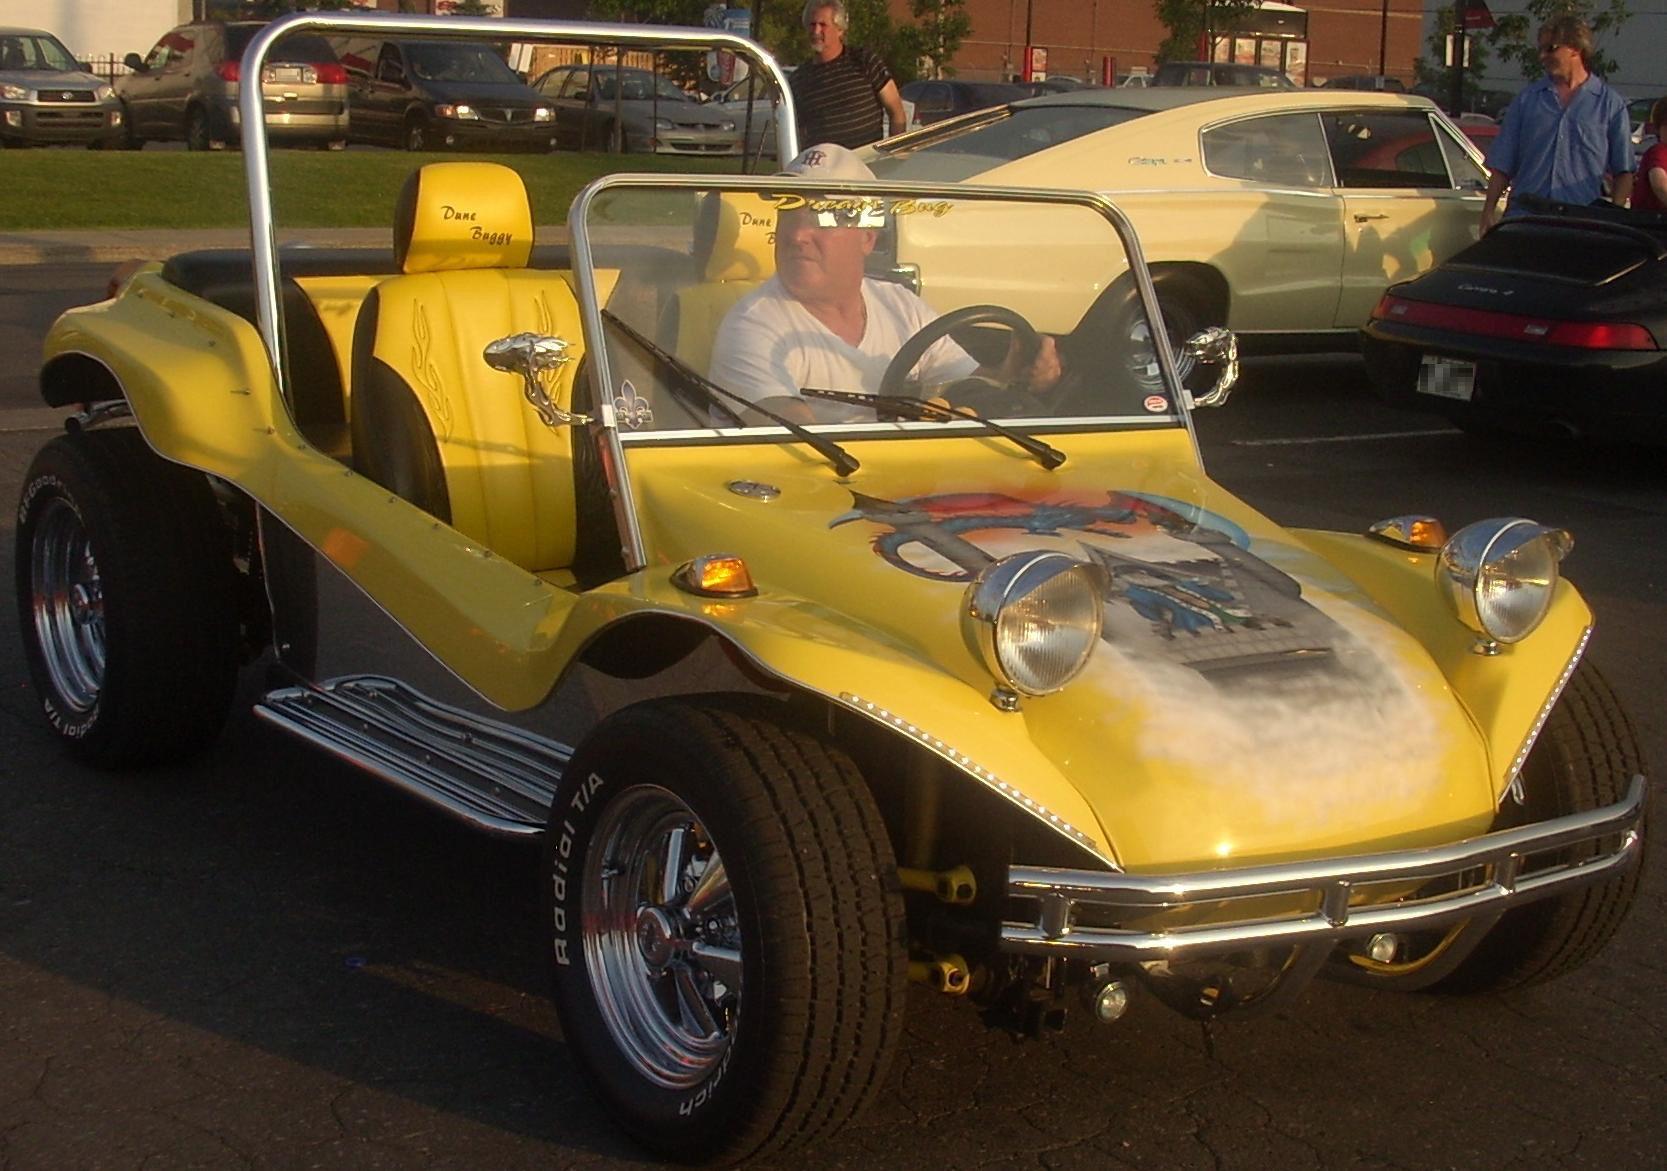 Billede fra http://upload.wikimedia.org/wikipedia/commons/5/5a/Volkswagen_Dune_Buggy_(Gibeau_Orange_Julep_'10).jpg.